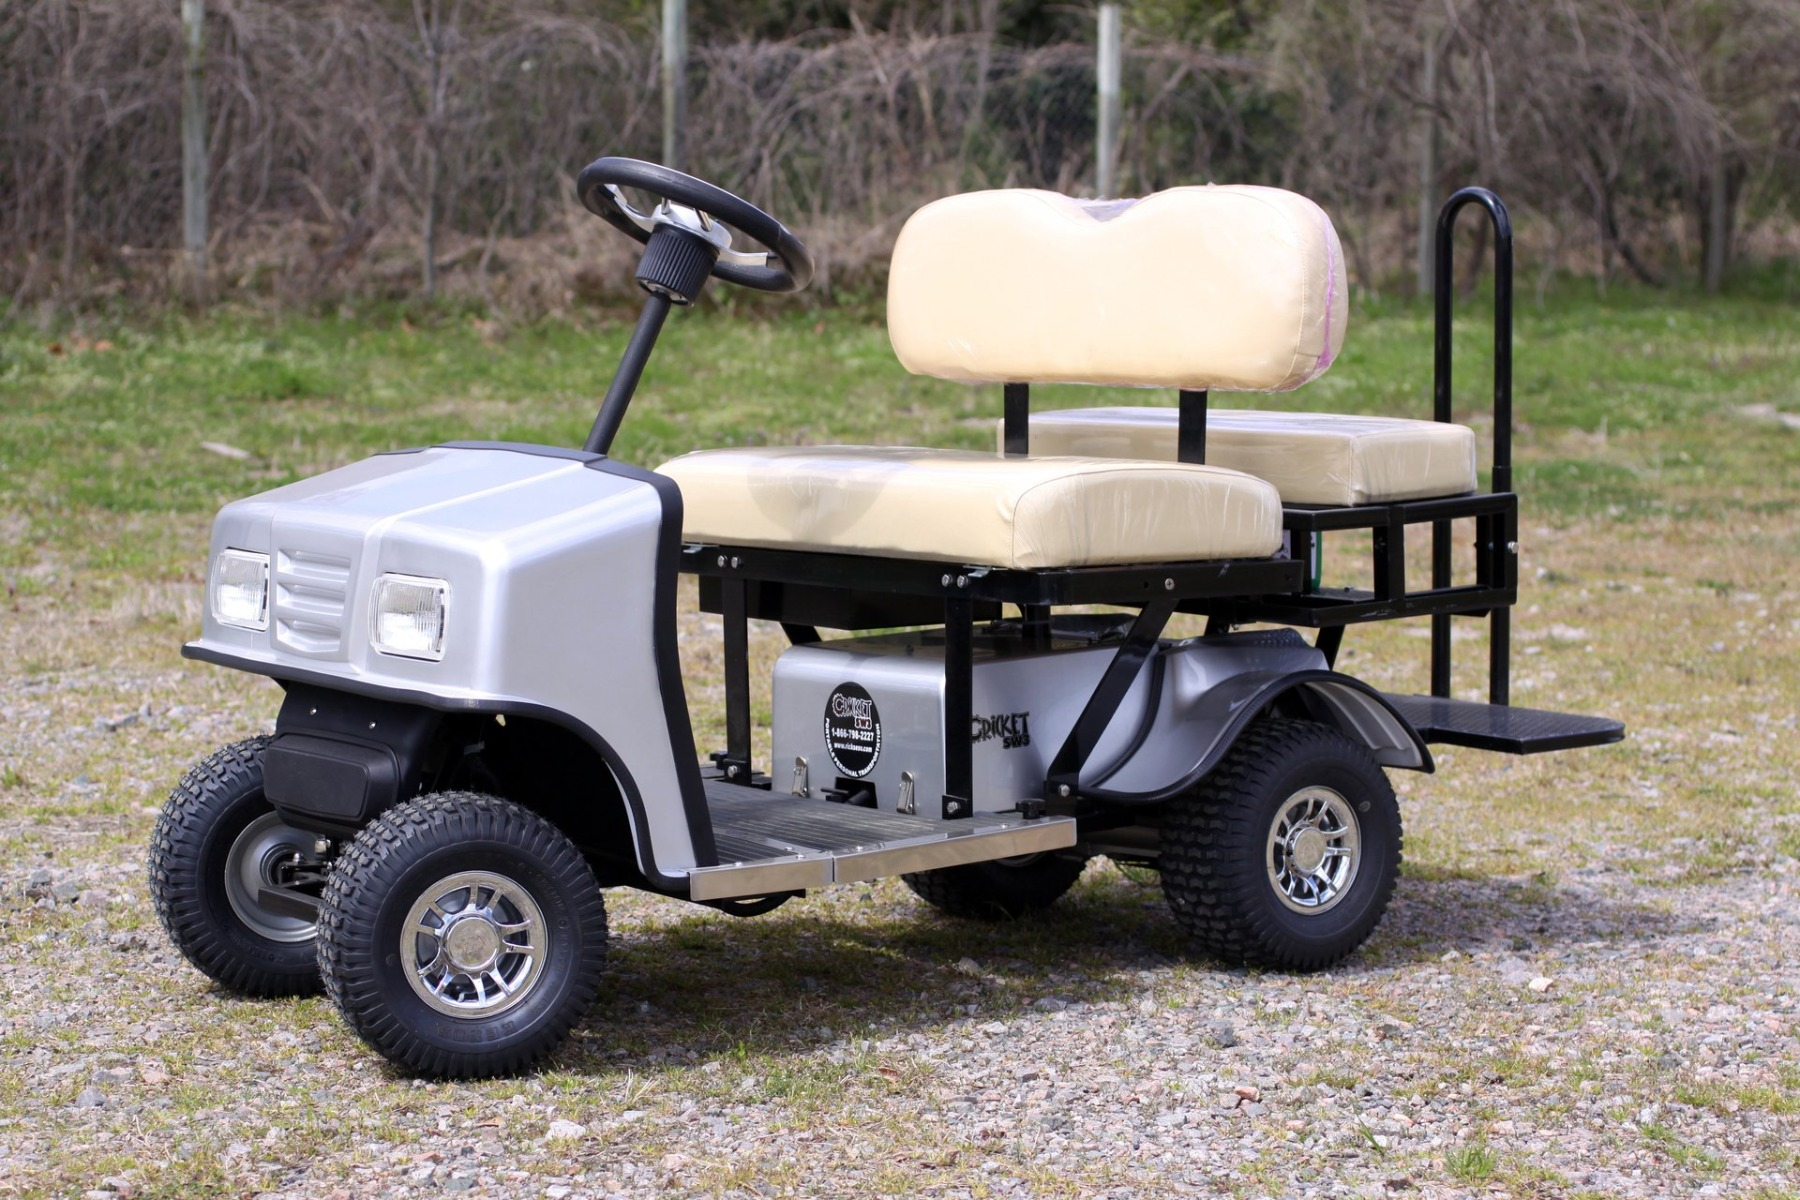 Cricket SX-3 Mini Golf Cart